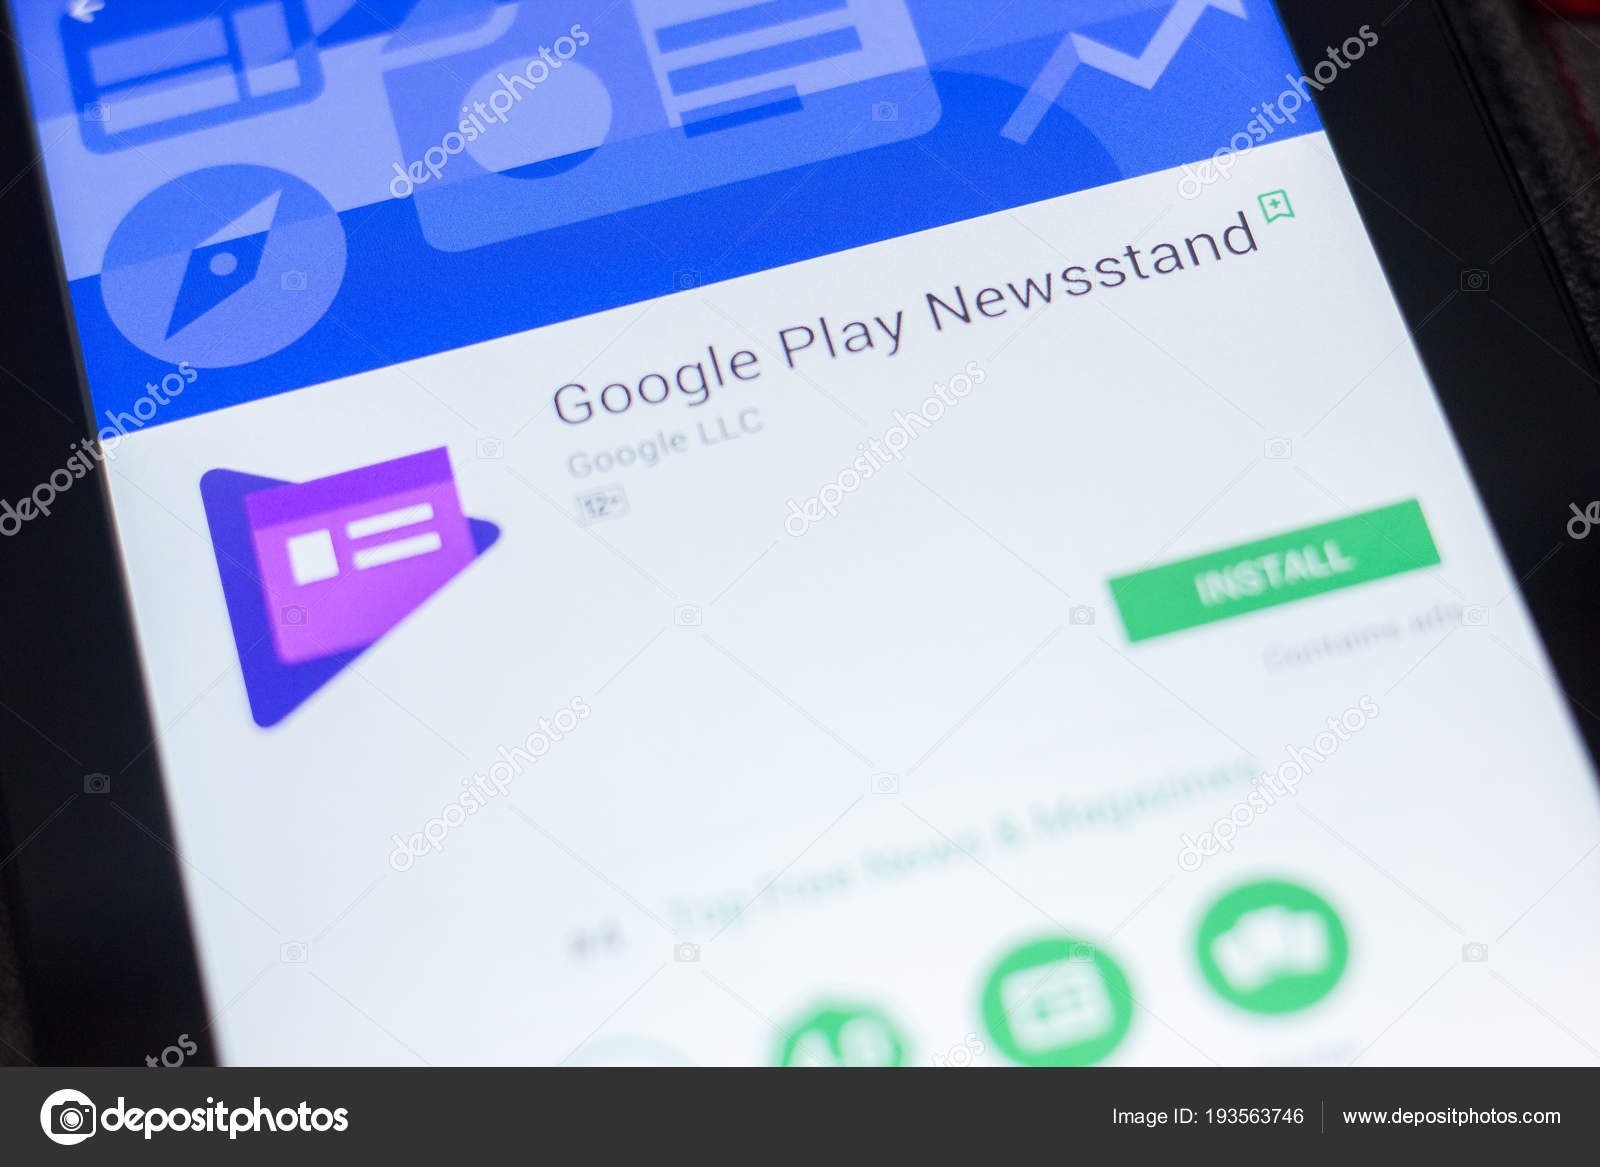 Ryazan, Russia - April 19, 2018 - Google Play Newsstand